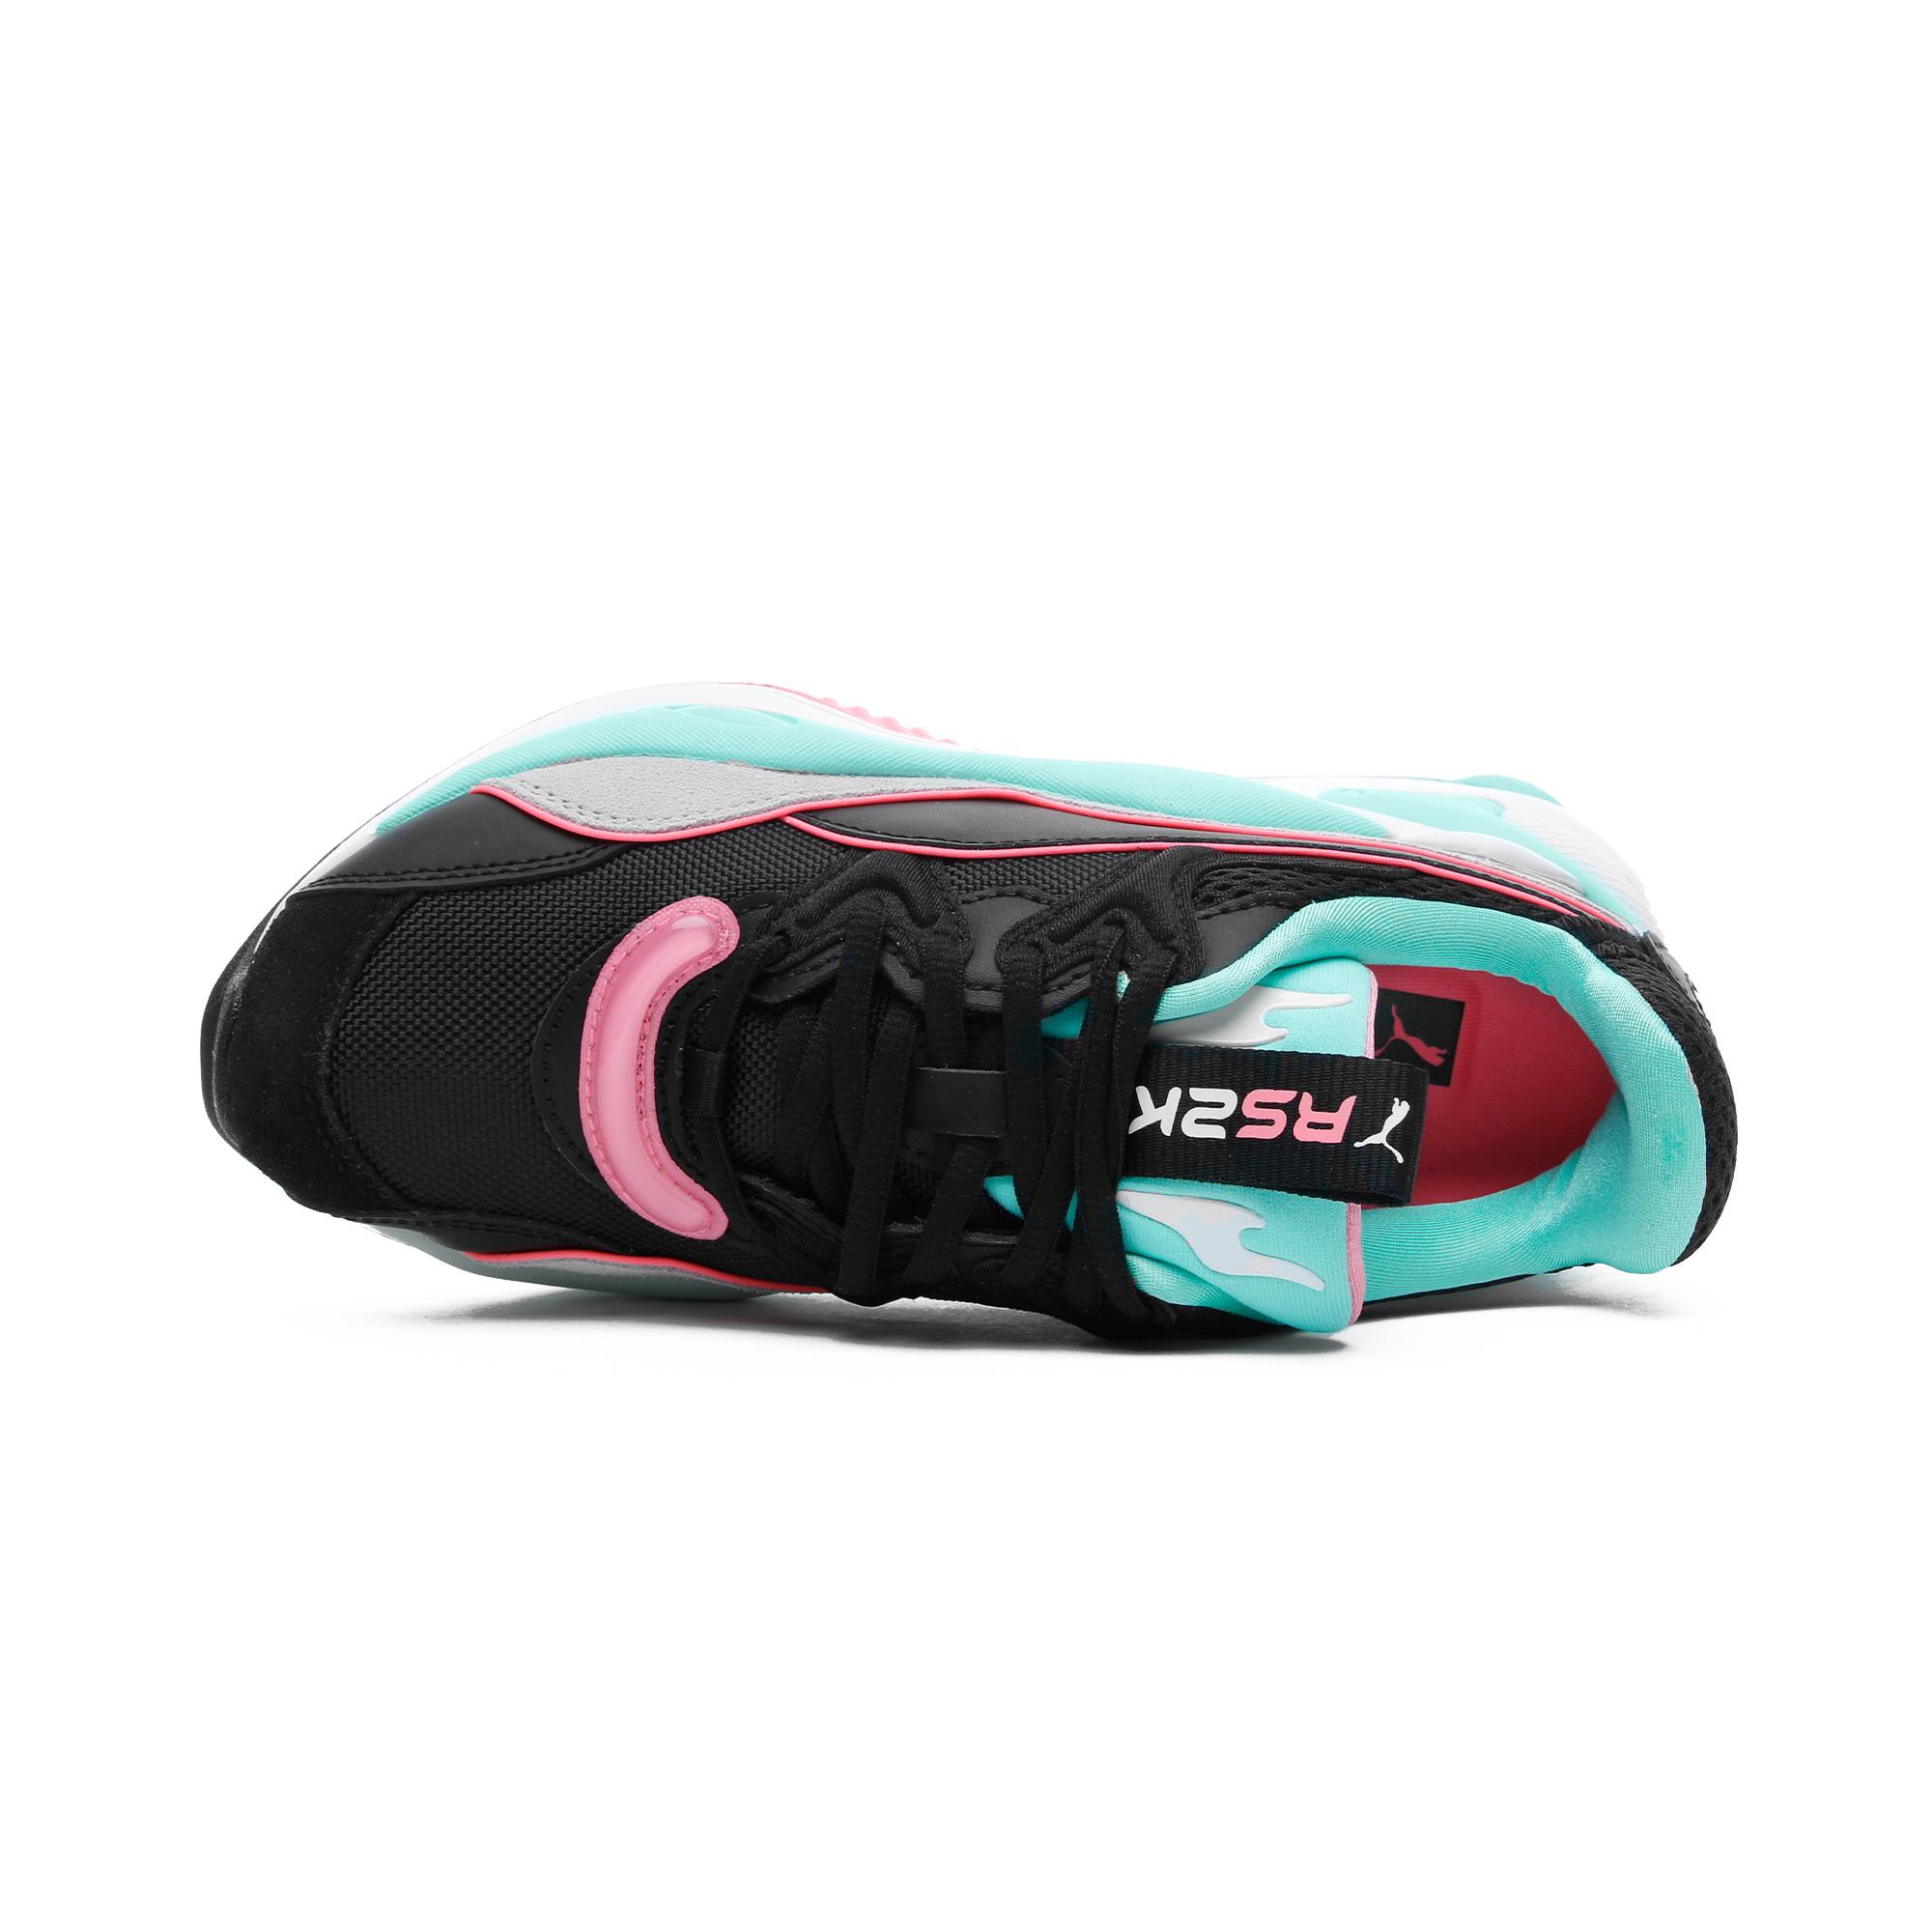 Puma RS-2K Messaging Kadın Spor Ayakkabı